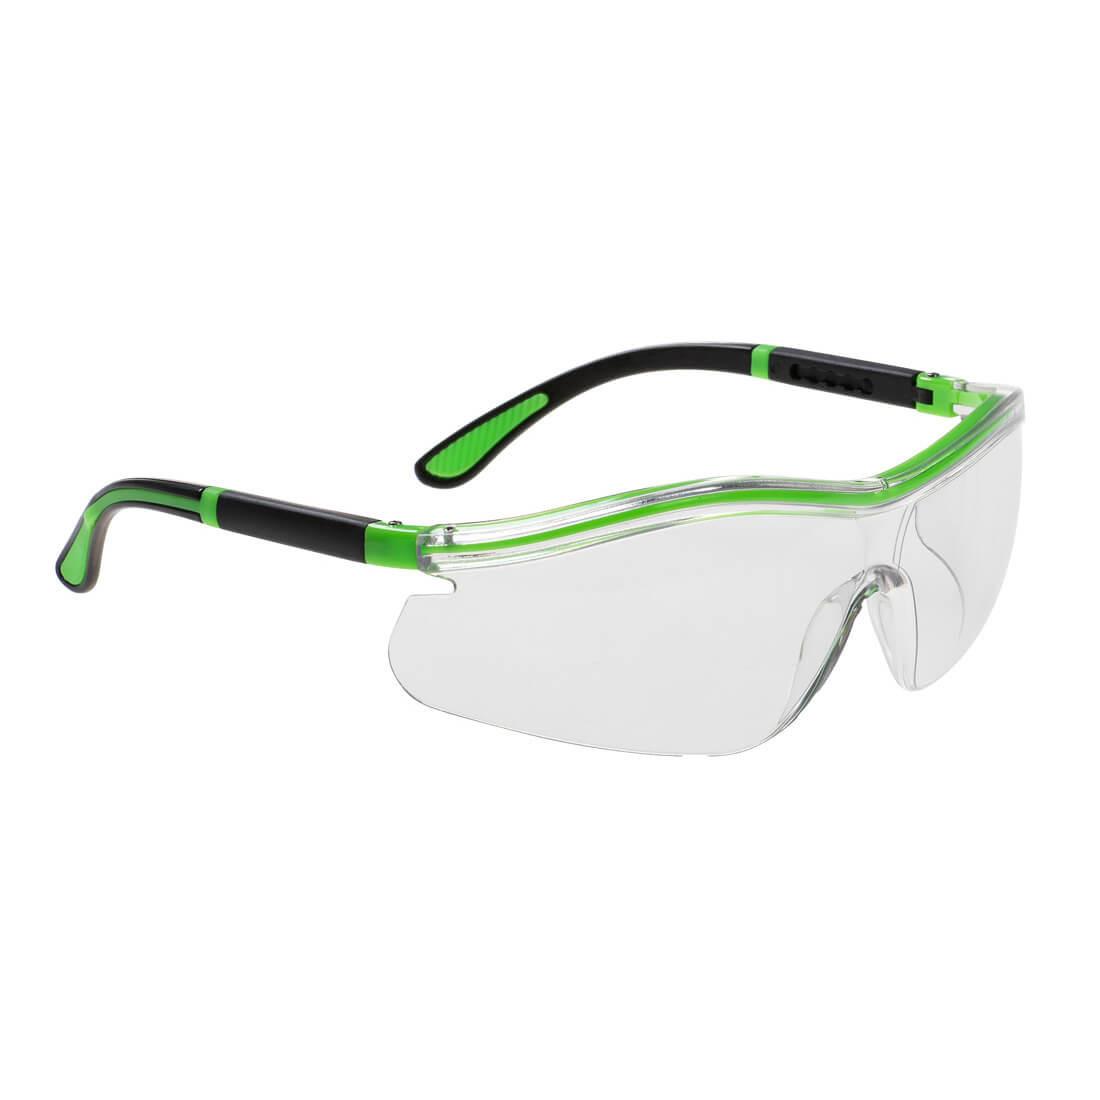 Ochelari Neon Safety - Echipamente de protectie personala